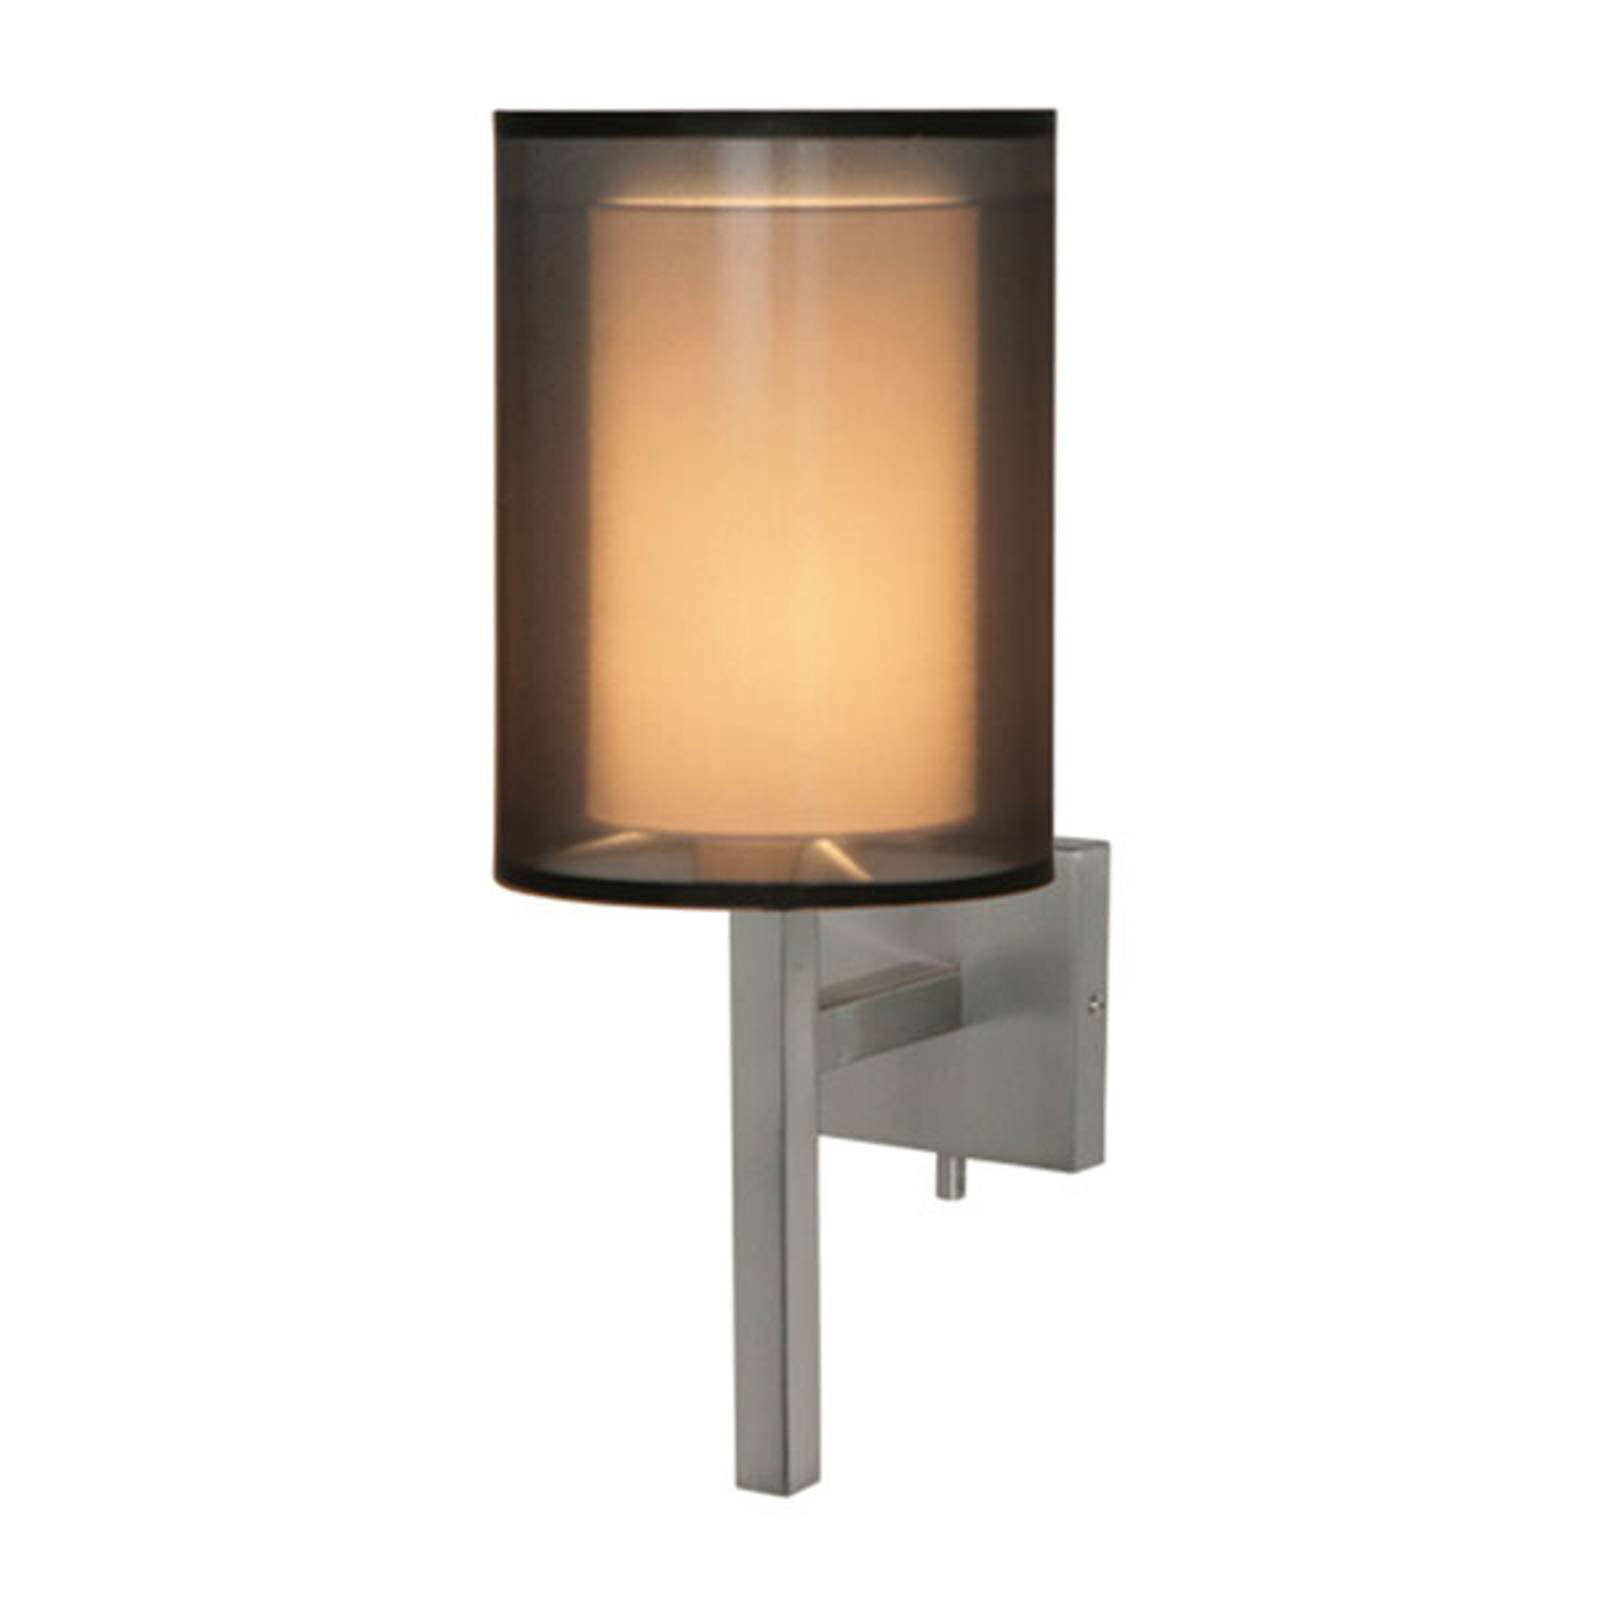 Vegglampe Quattro med organza-skjerm